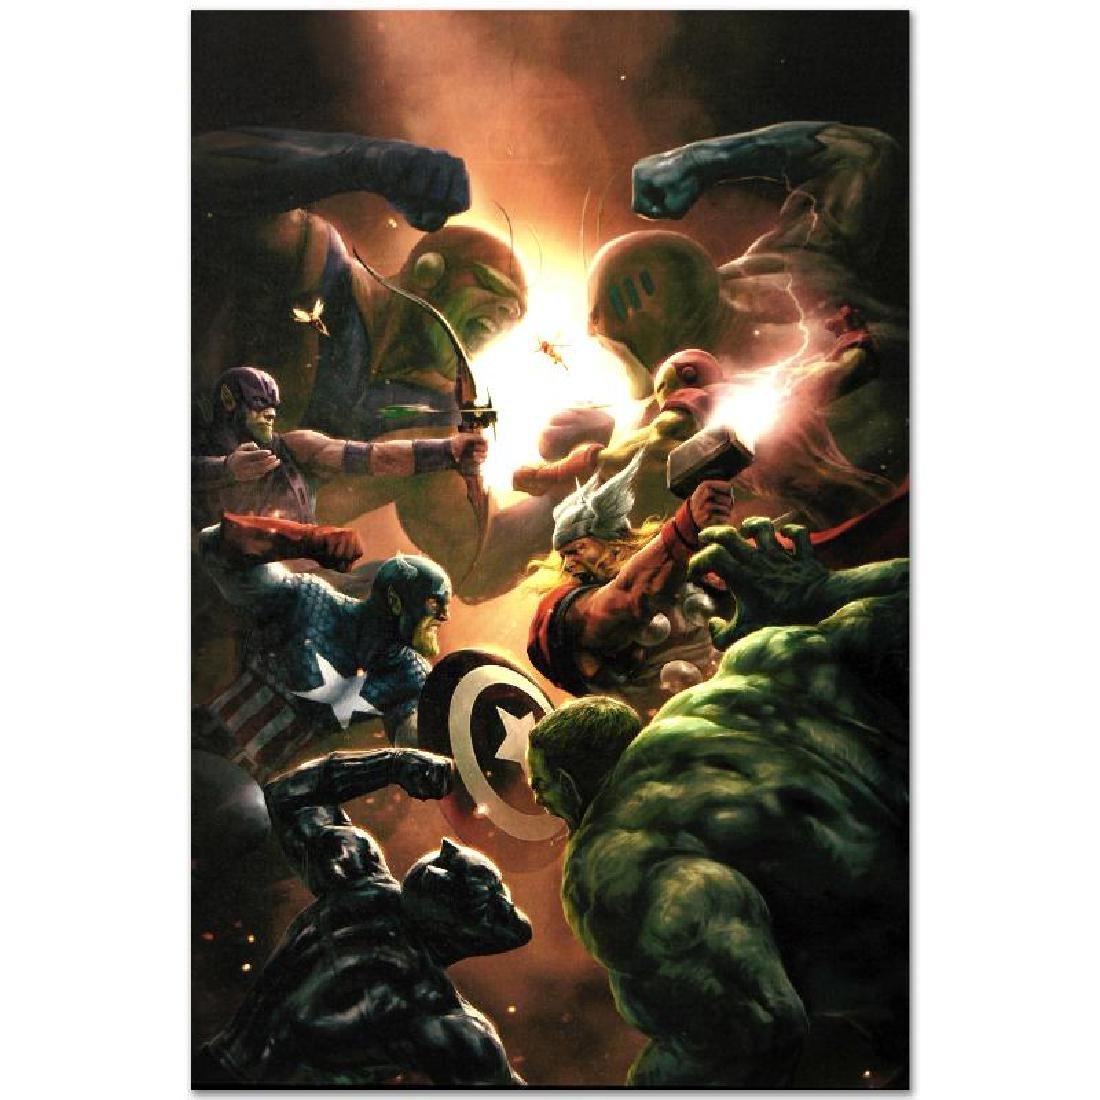 New Avengers #43 by Marvel Comics - 3